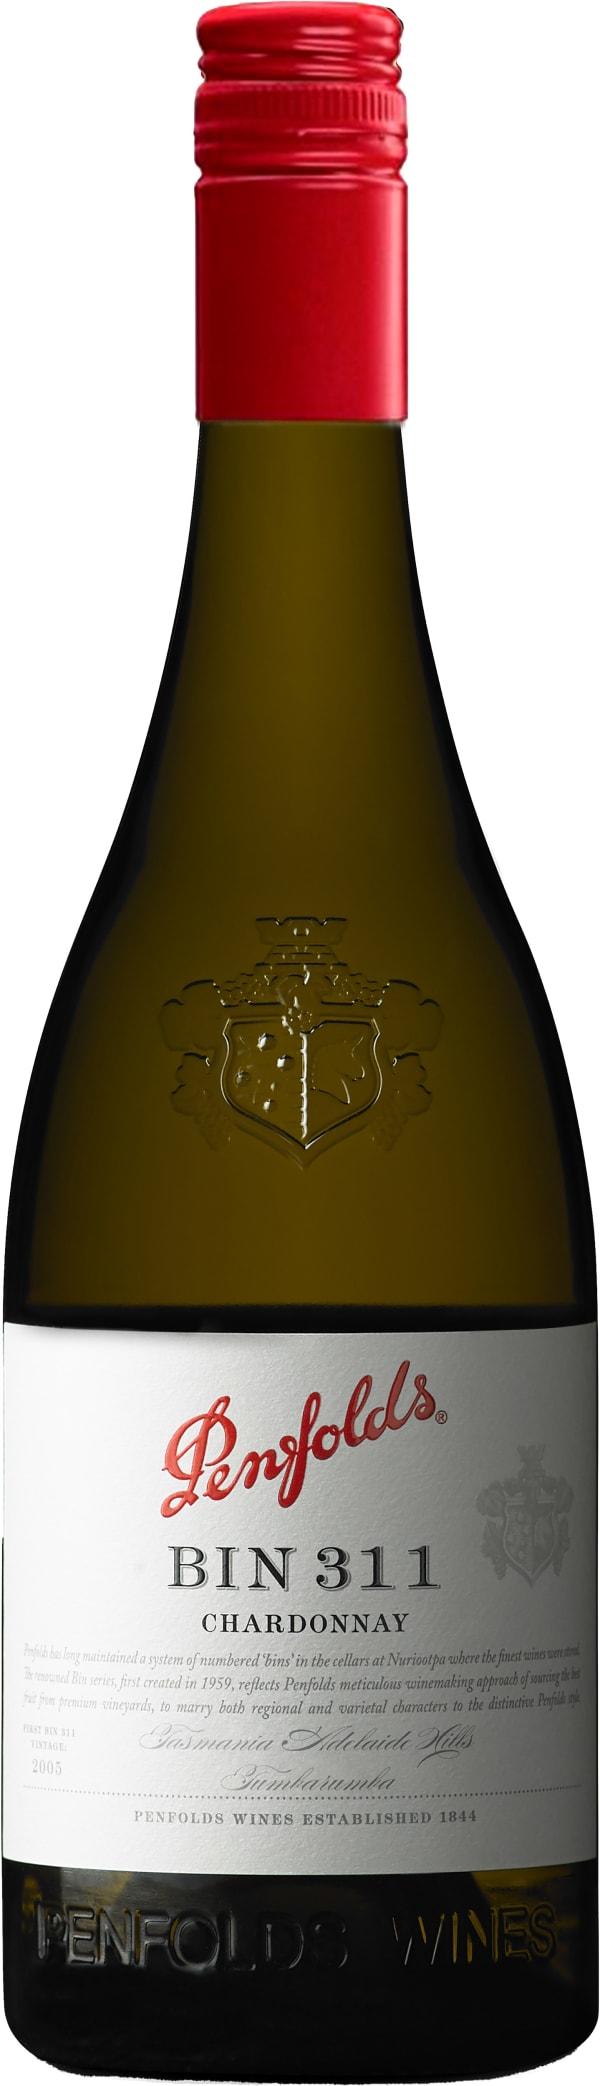 Penfolds BIN 311 Chardonnay 2014